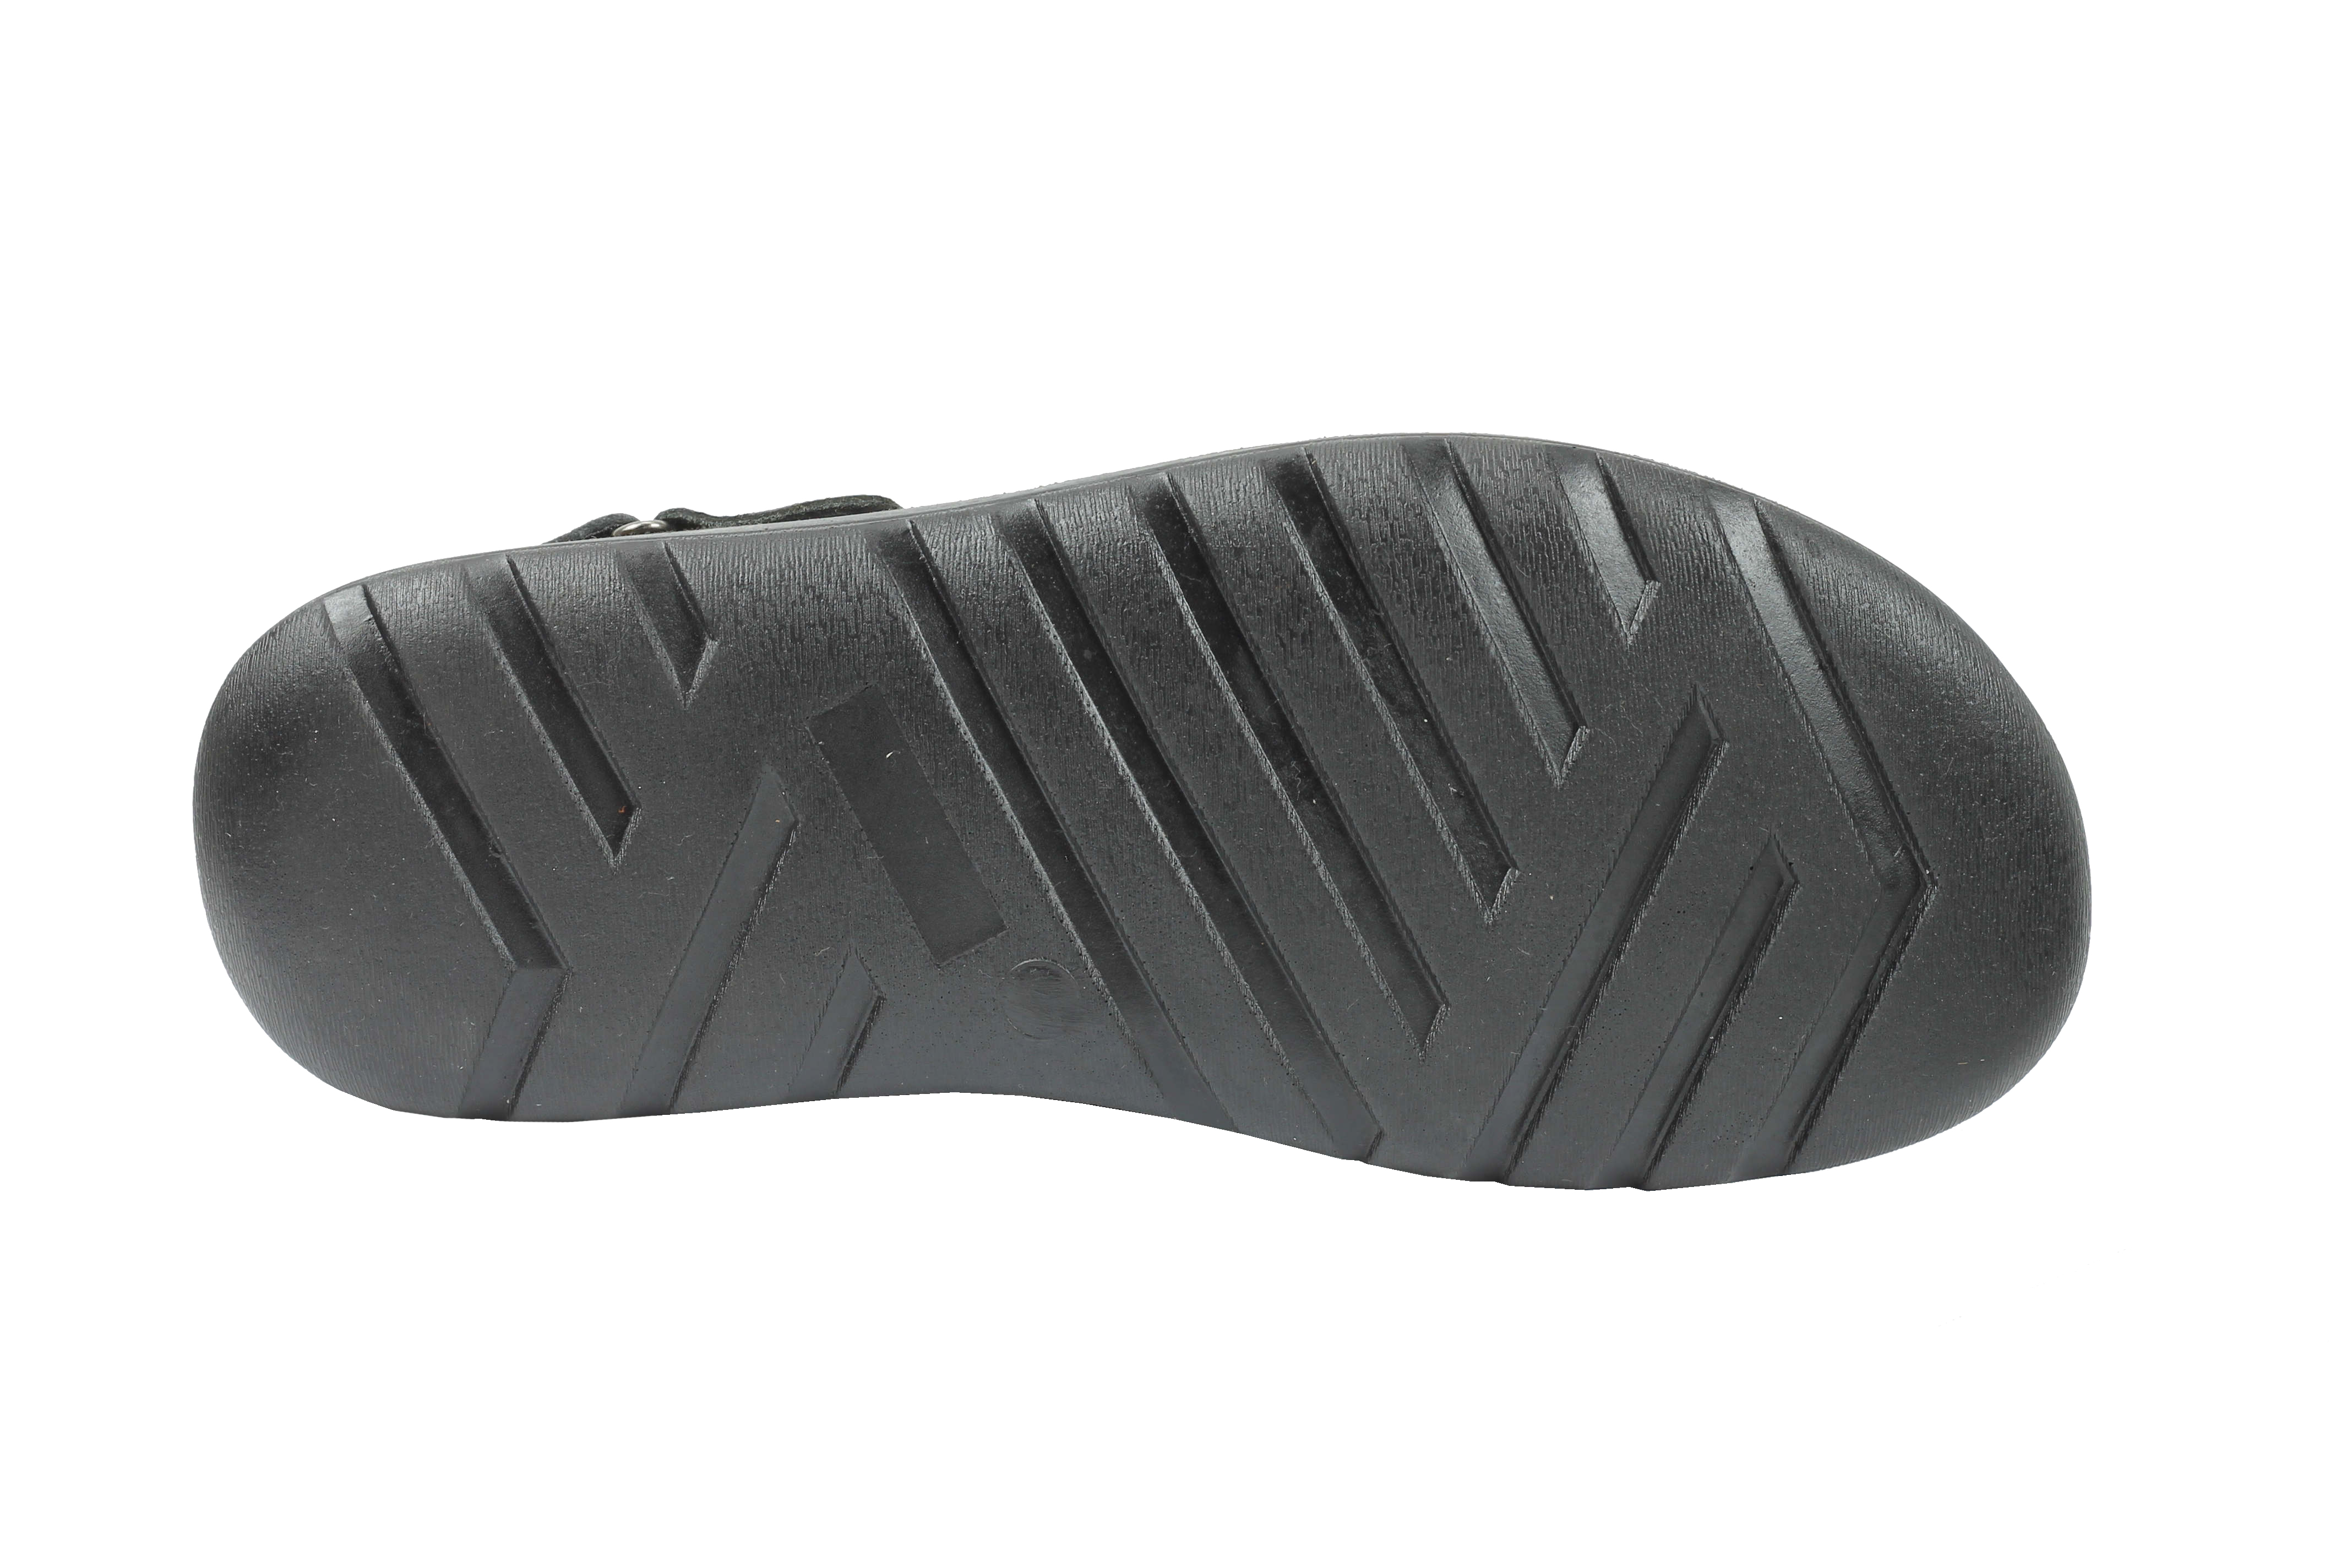 New-Mens-Real-Leather-Walking-Sandals-Black-Brown-Toe-Loop-Adjustable-Back-Strap thumbnail 3